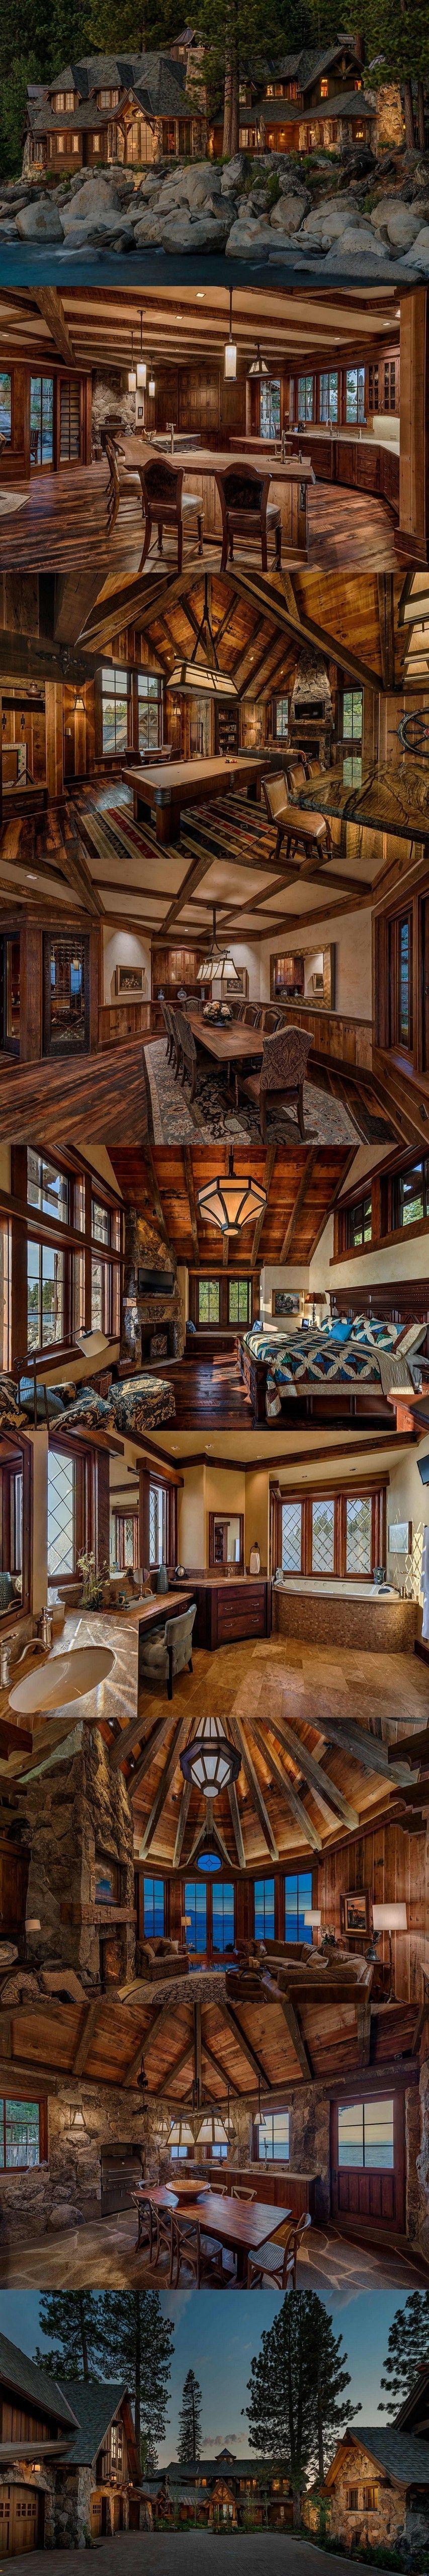 East Shore Residence, Lake Tahoe, NV | Mansions | Pinterest ...